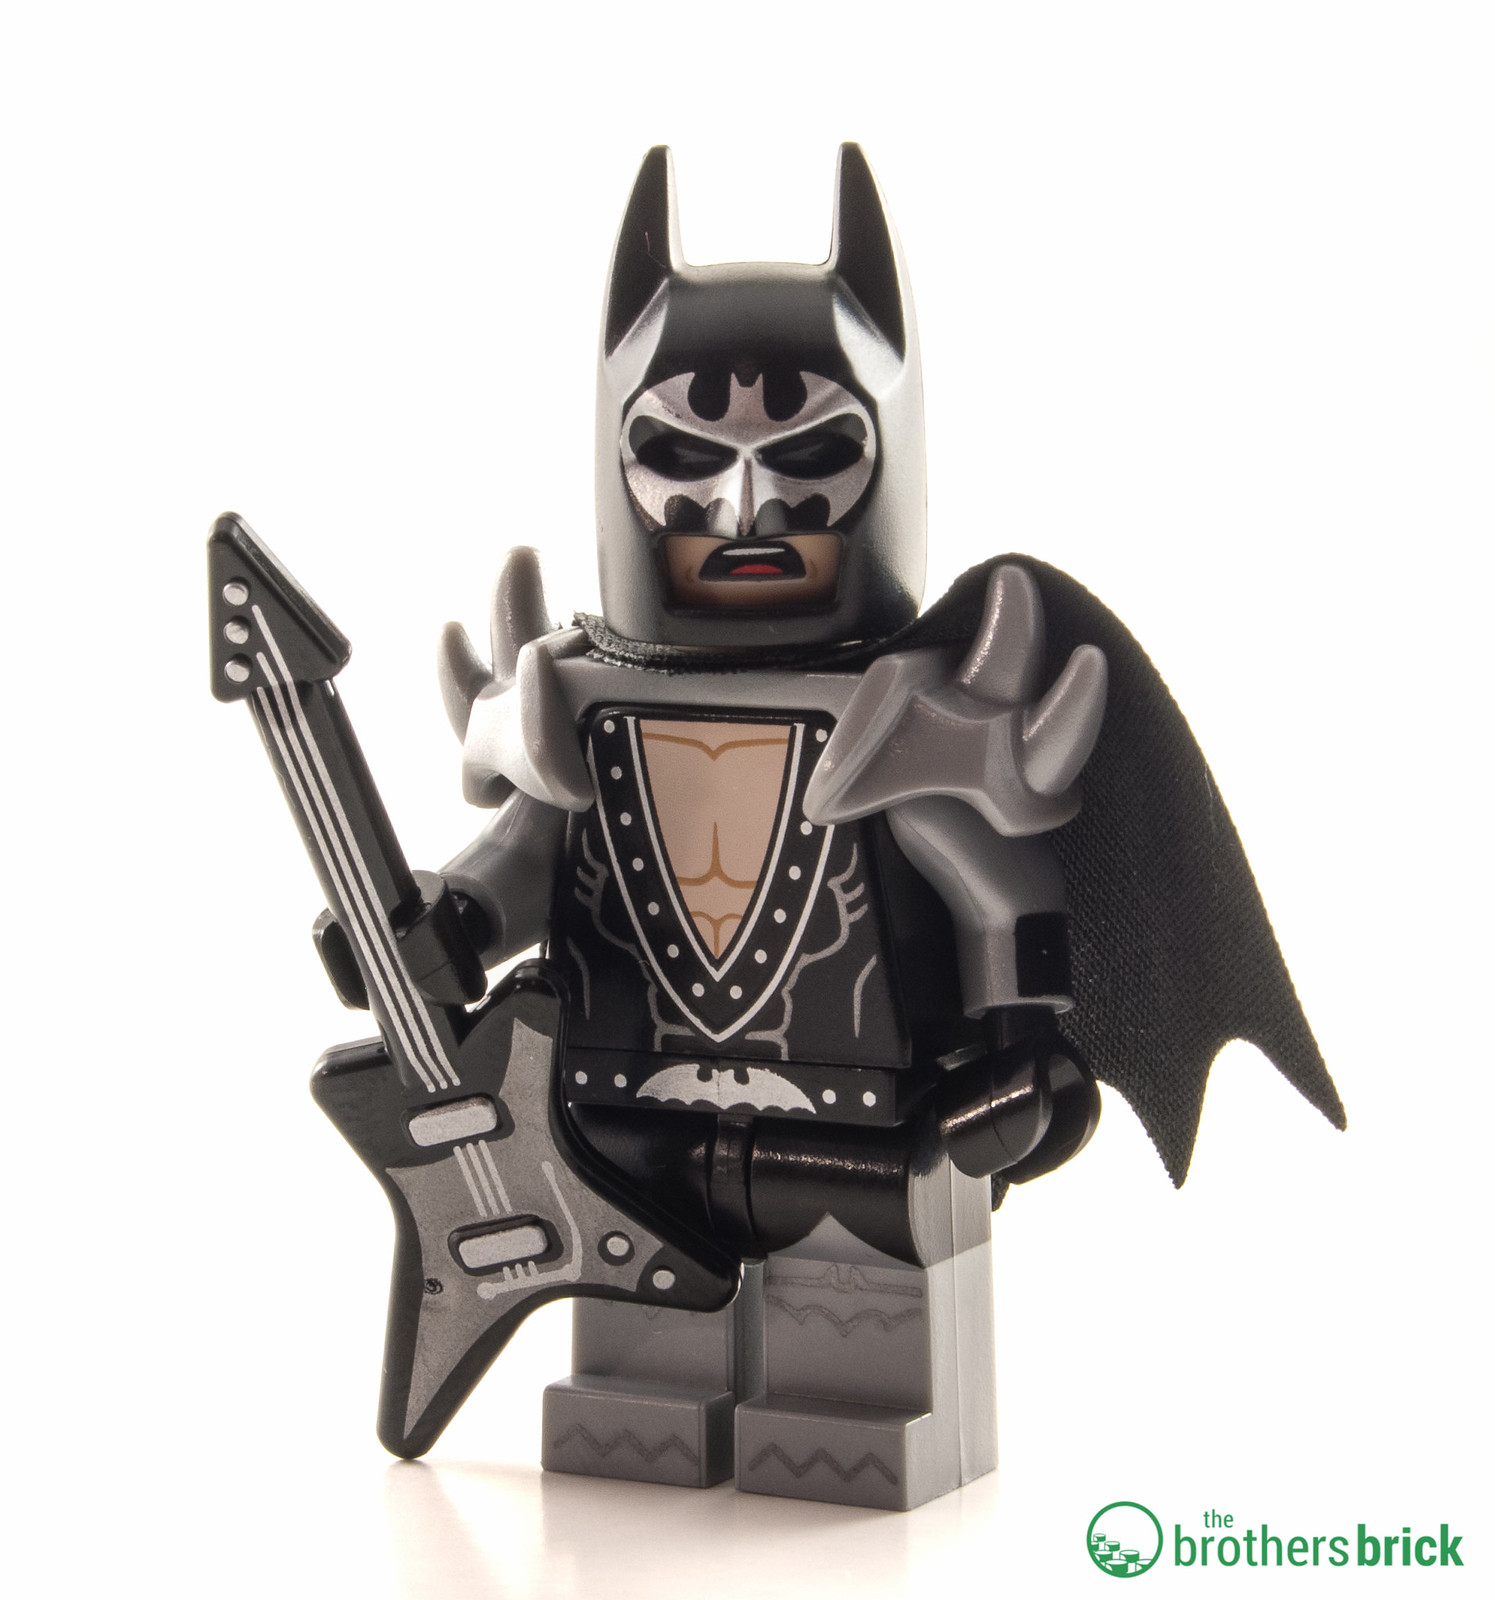 Bat Brick Batman Tool : The lego batman movie collectible minifigures feel guide